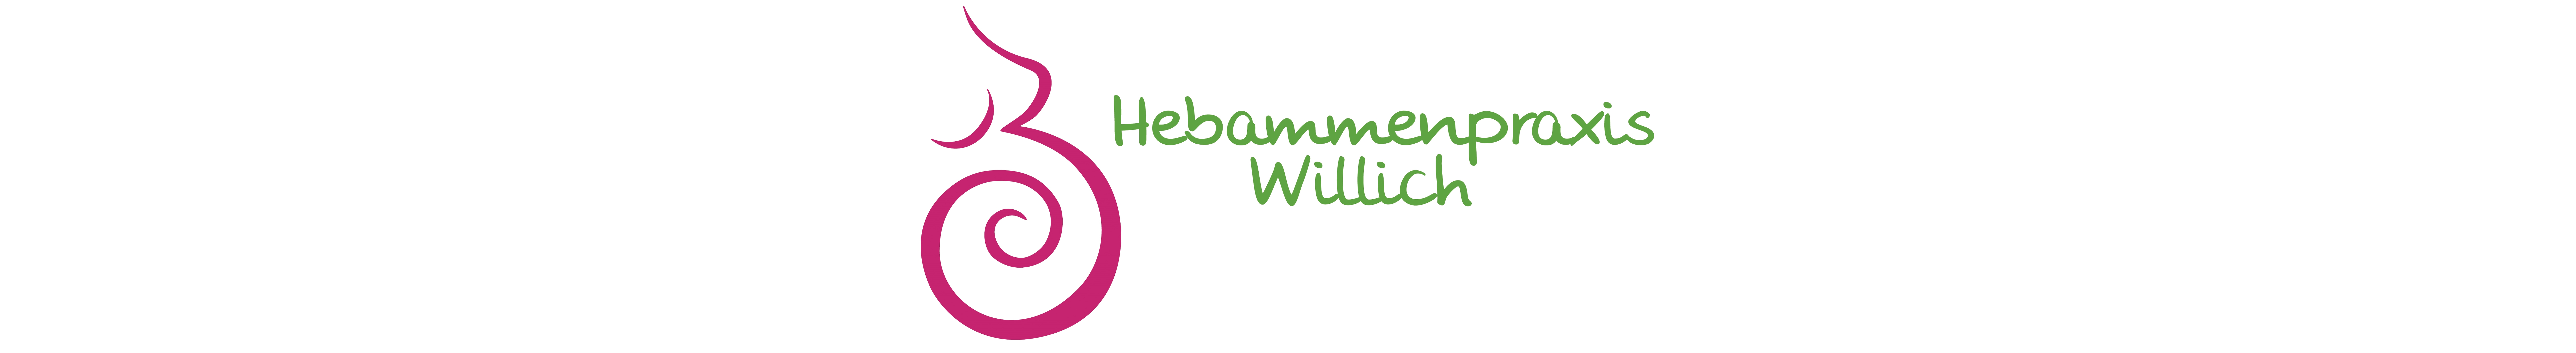 Hebammenpraxis Willich